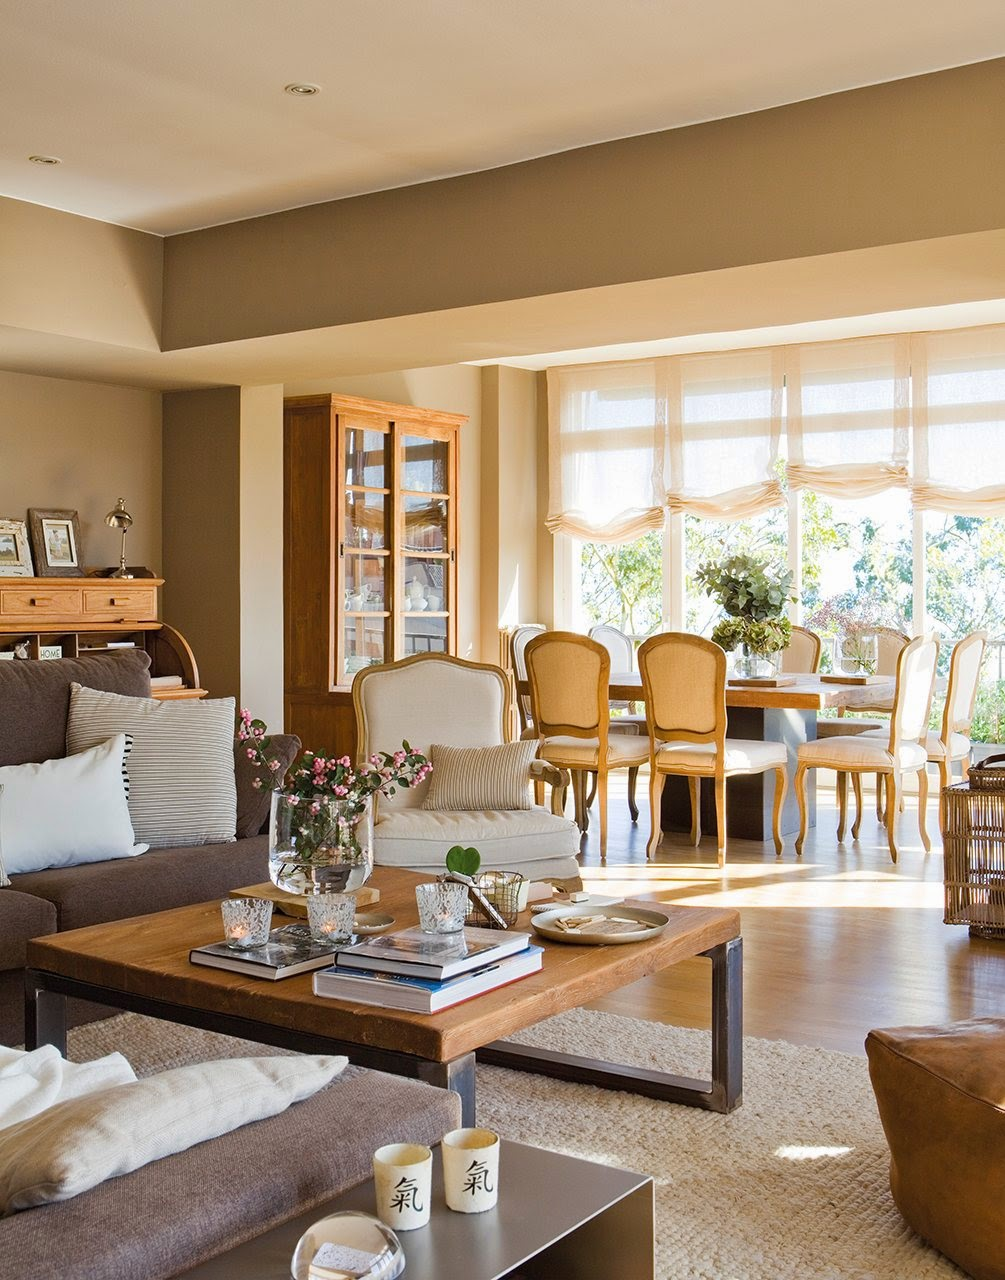 Penthouse n tonuri neutre jurnal de design interior for Comedor que se hace grande